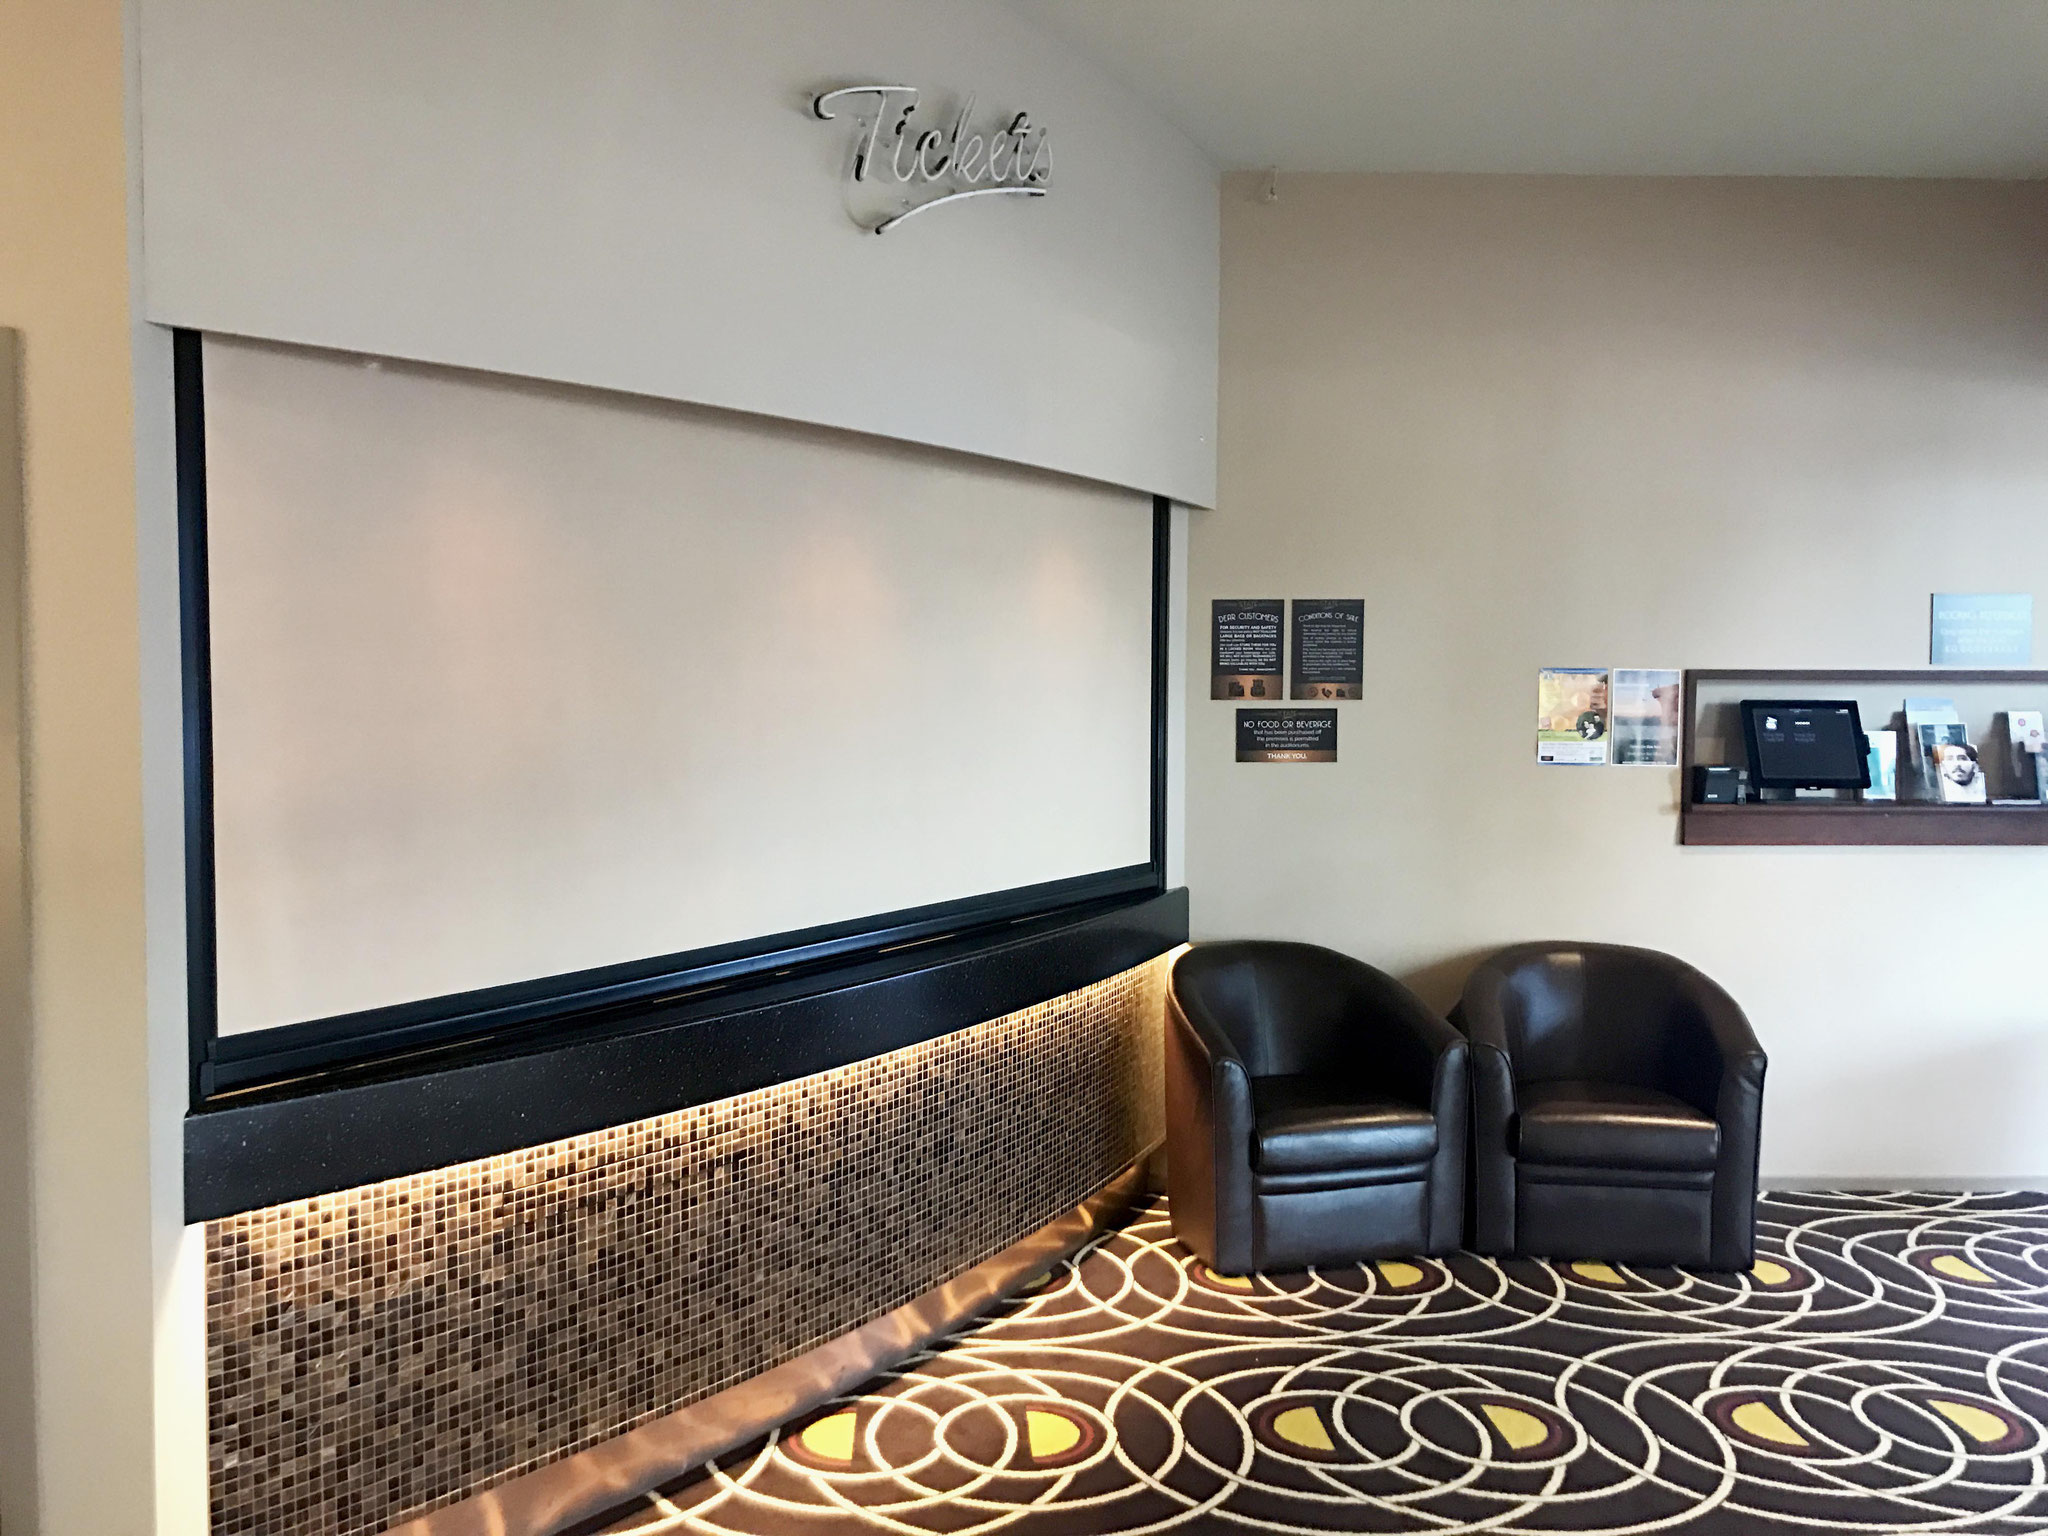 State Cinema Acoustic Ziptrak Blind, Nelson